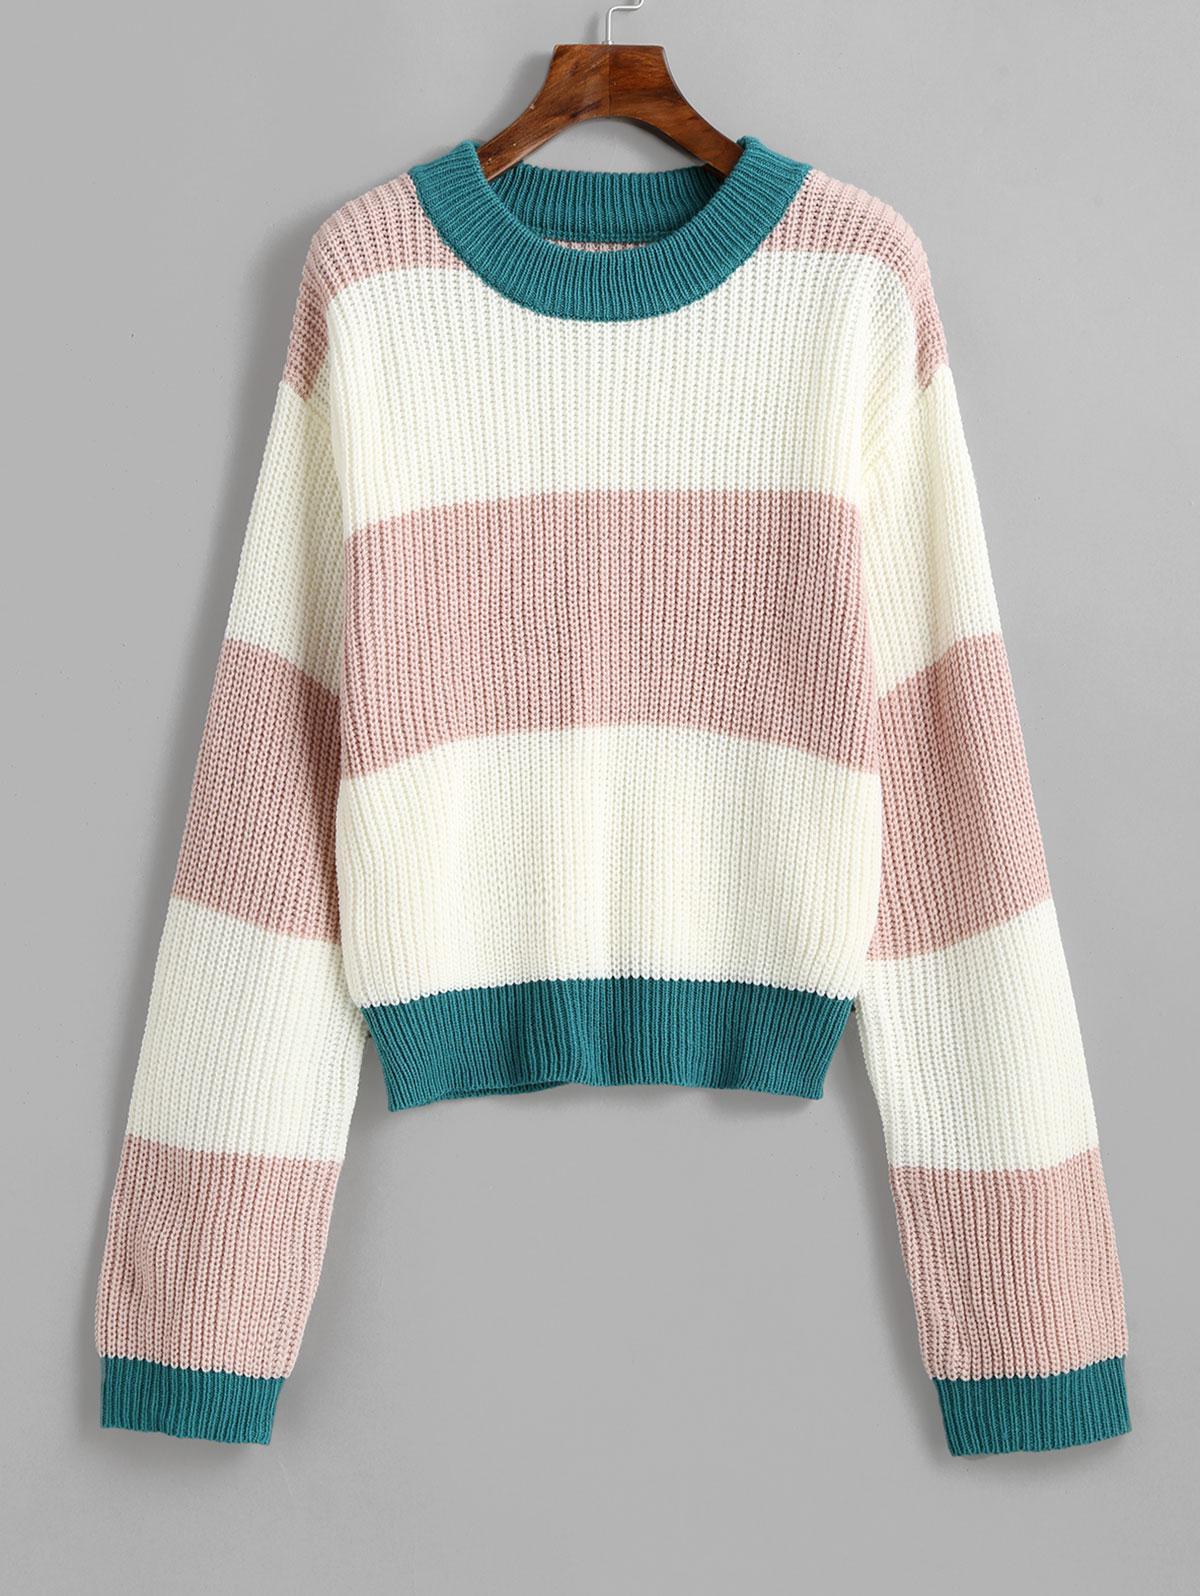 ZAFUL Pullover Crew Neck Colorblock Sweater